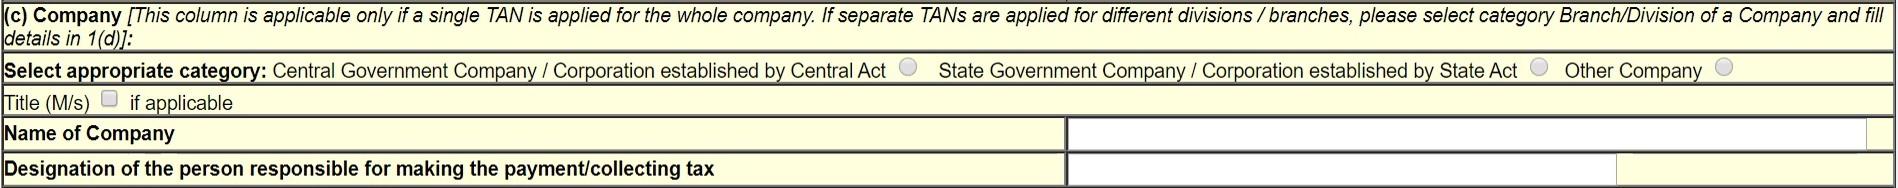 How to apply tan - 6 ii.jpg